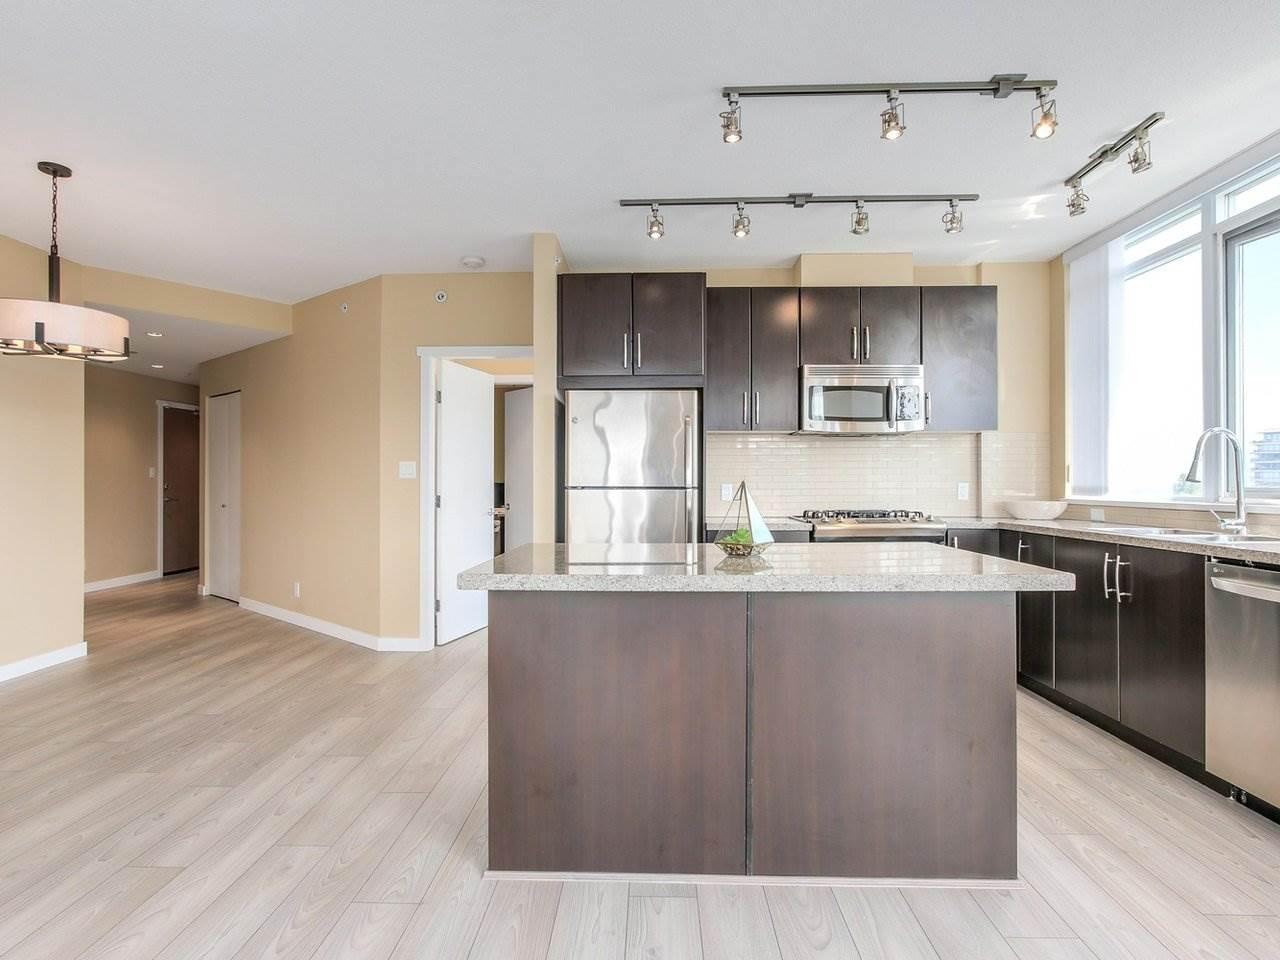 Condo Apartment at 3001 660 NOOTKA WAY, Unit 3001, Port Moody, British Columbia. Image 5